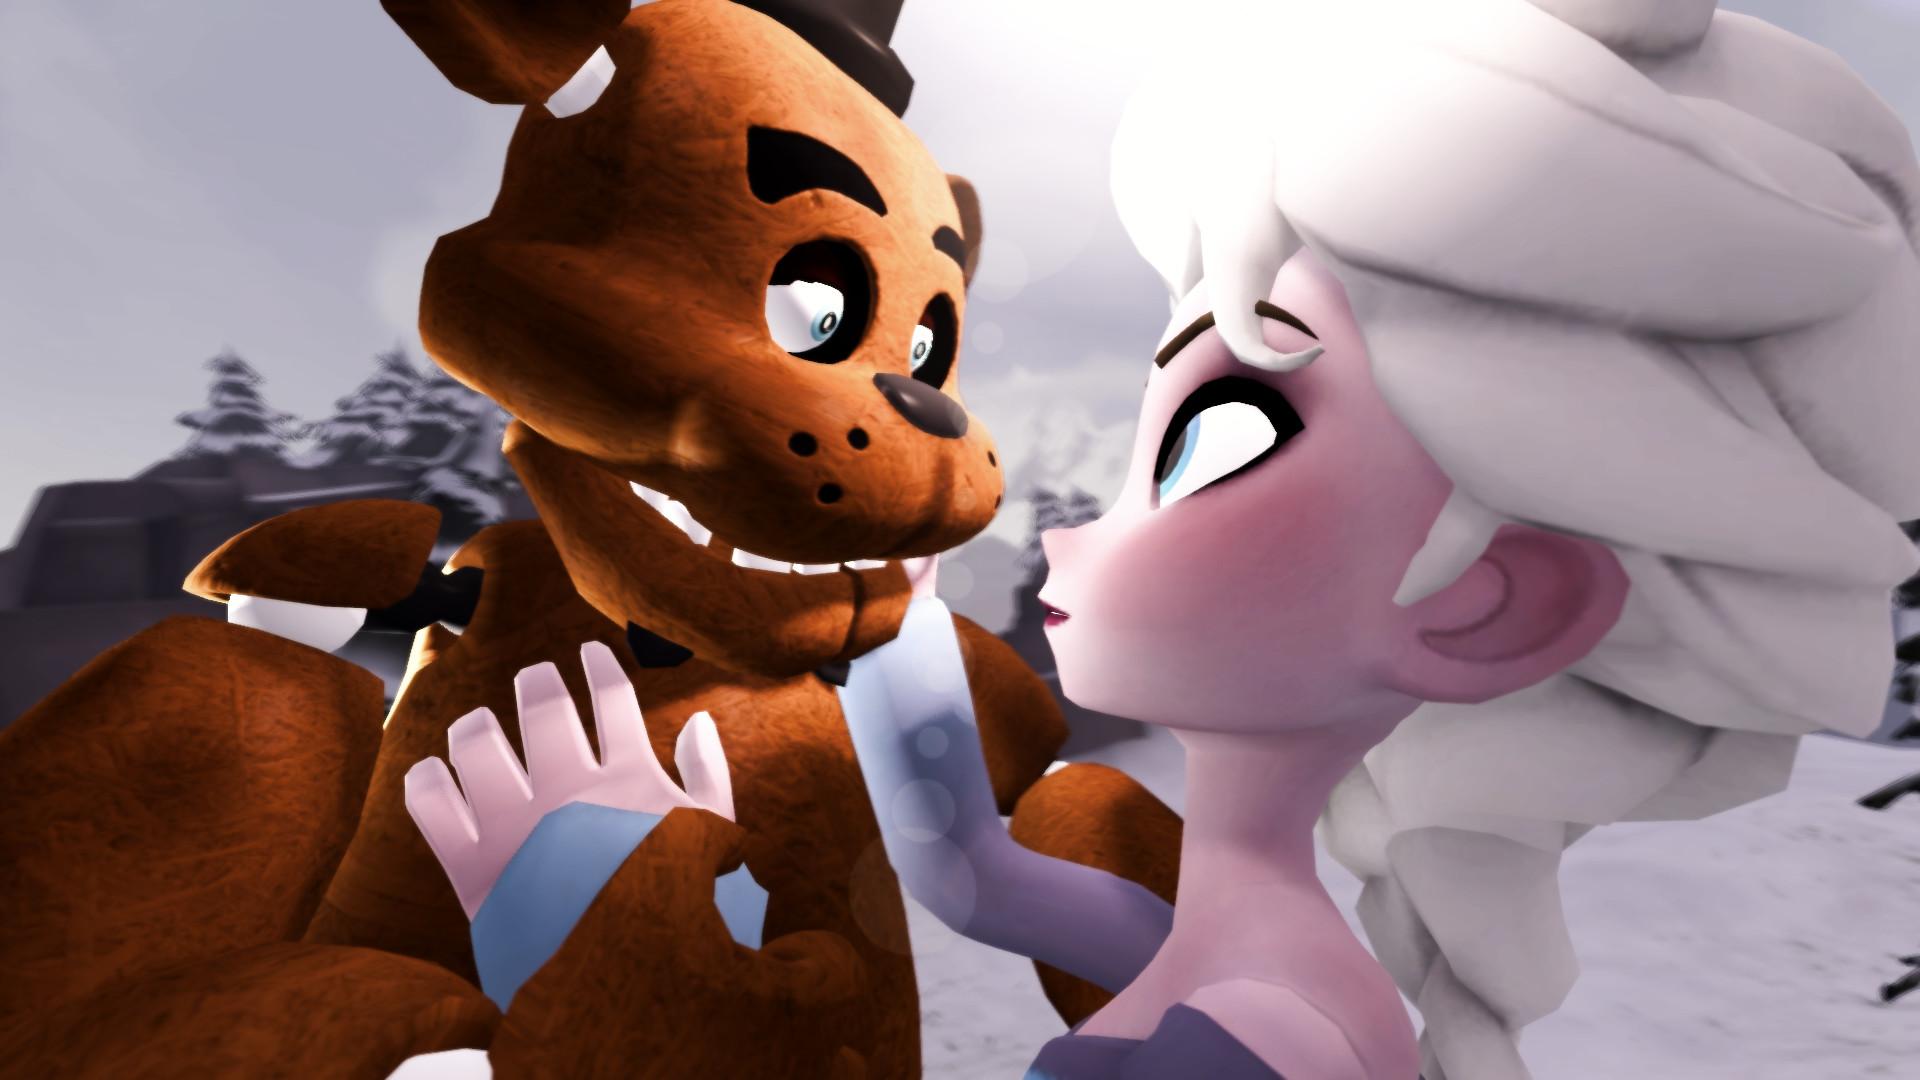 General Five Nights at Freddy's Freddy Fazbear crossover Frozen  (movie) Princess Elsa